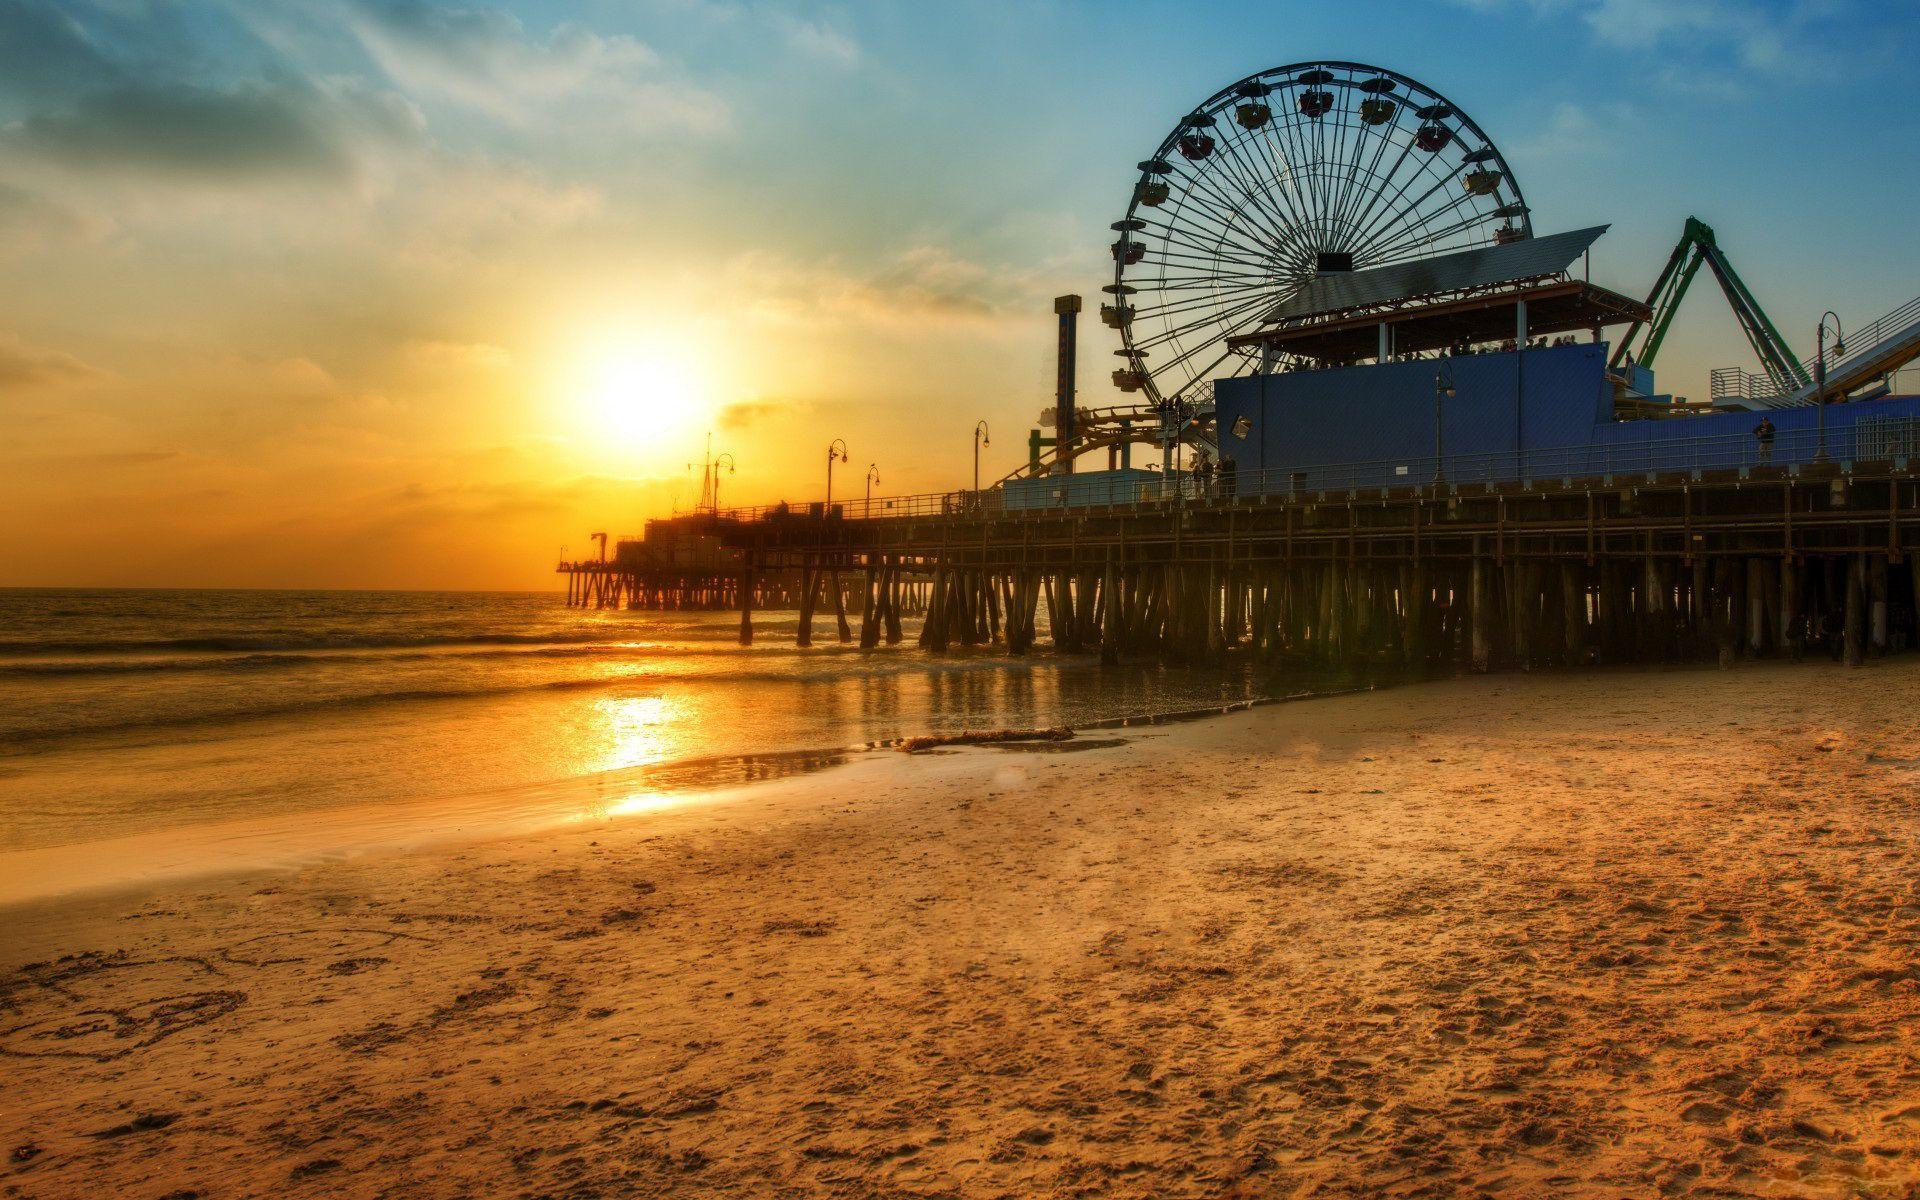 http://4.bp.blogspot.com/-8xSJPJHhmfc/UGL7Xv3UWAI/AAAAAAAAogY/UFwVxwqdqFc/s00/Atardecer-en-Santa-Monica-Los-Angeles_Fondos-de-Pantalla-de-Ciudades.jpg